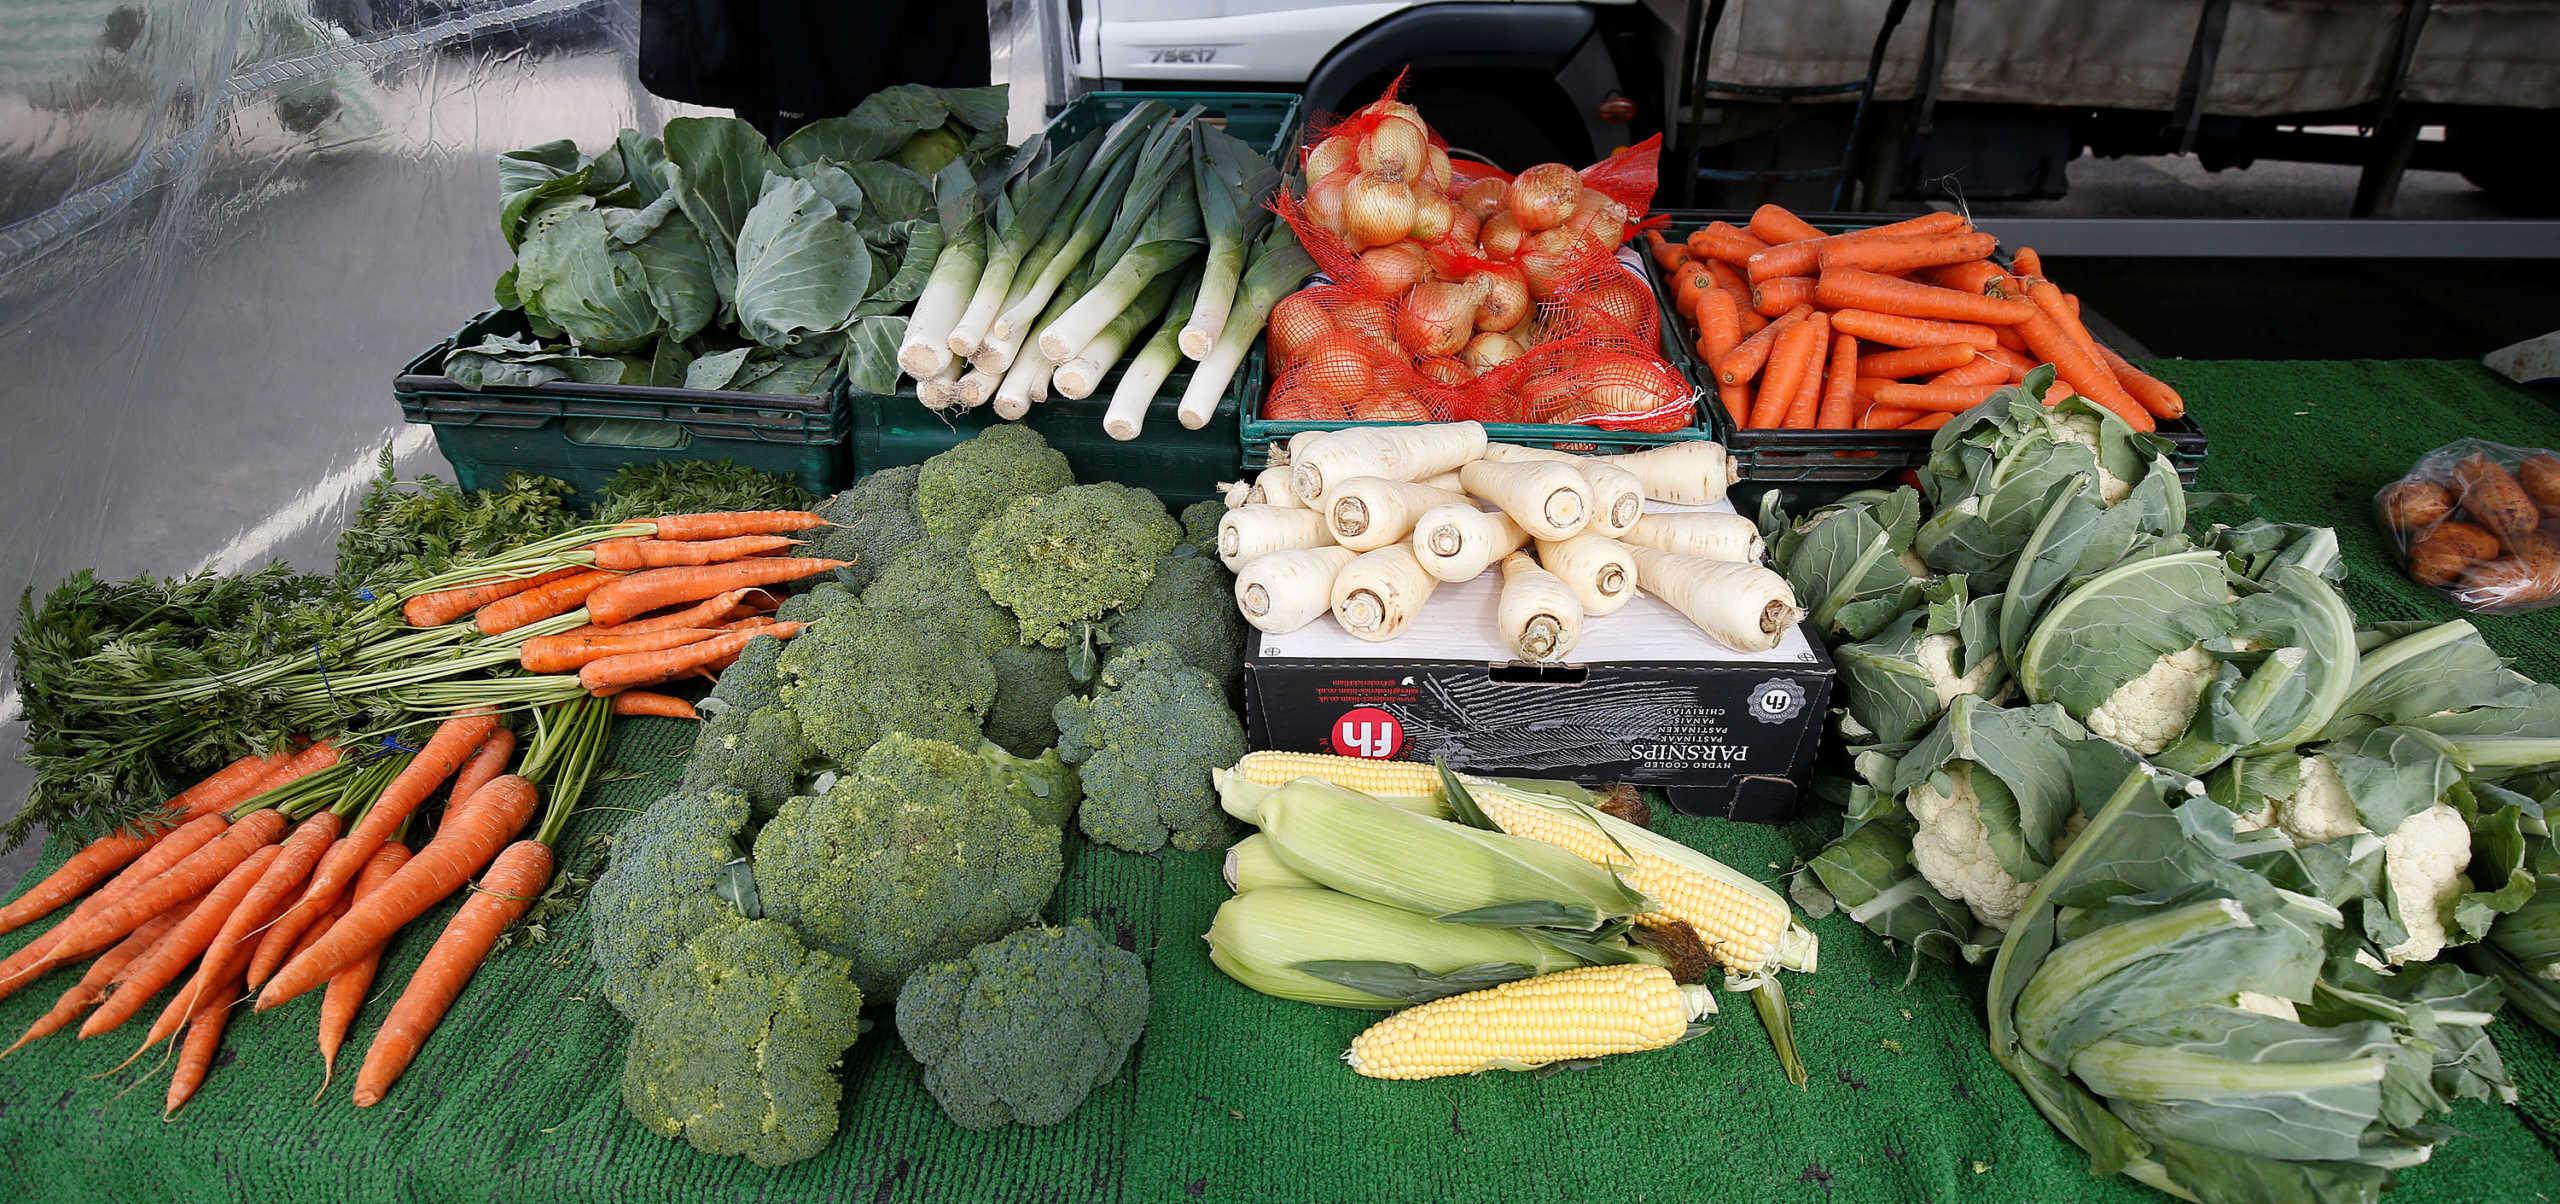 Mediterranean Combo: Εξαγωγικές ευκαιρίες για φρούτα και λαχανικά υψηλής ποιότητας